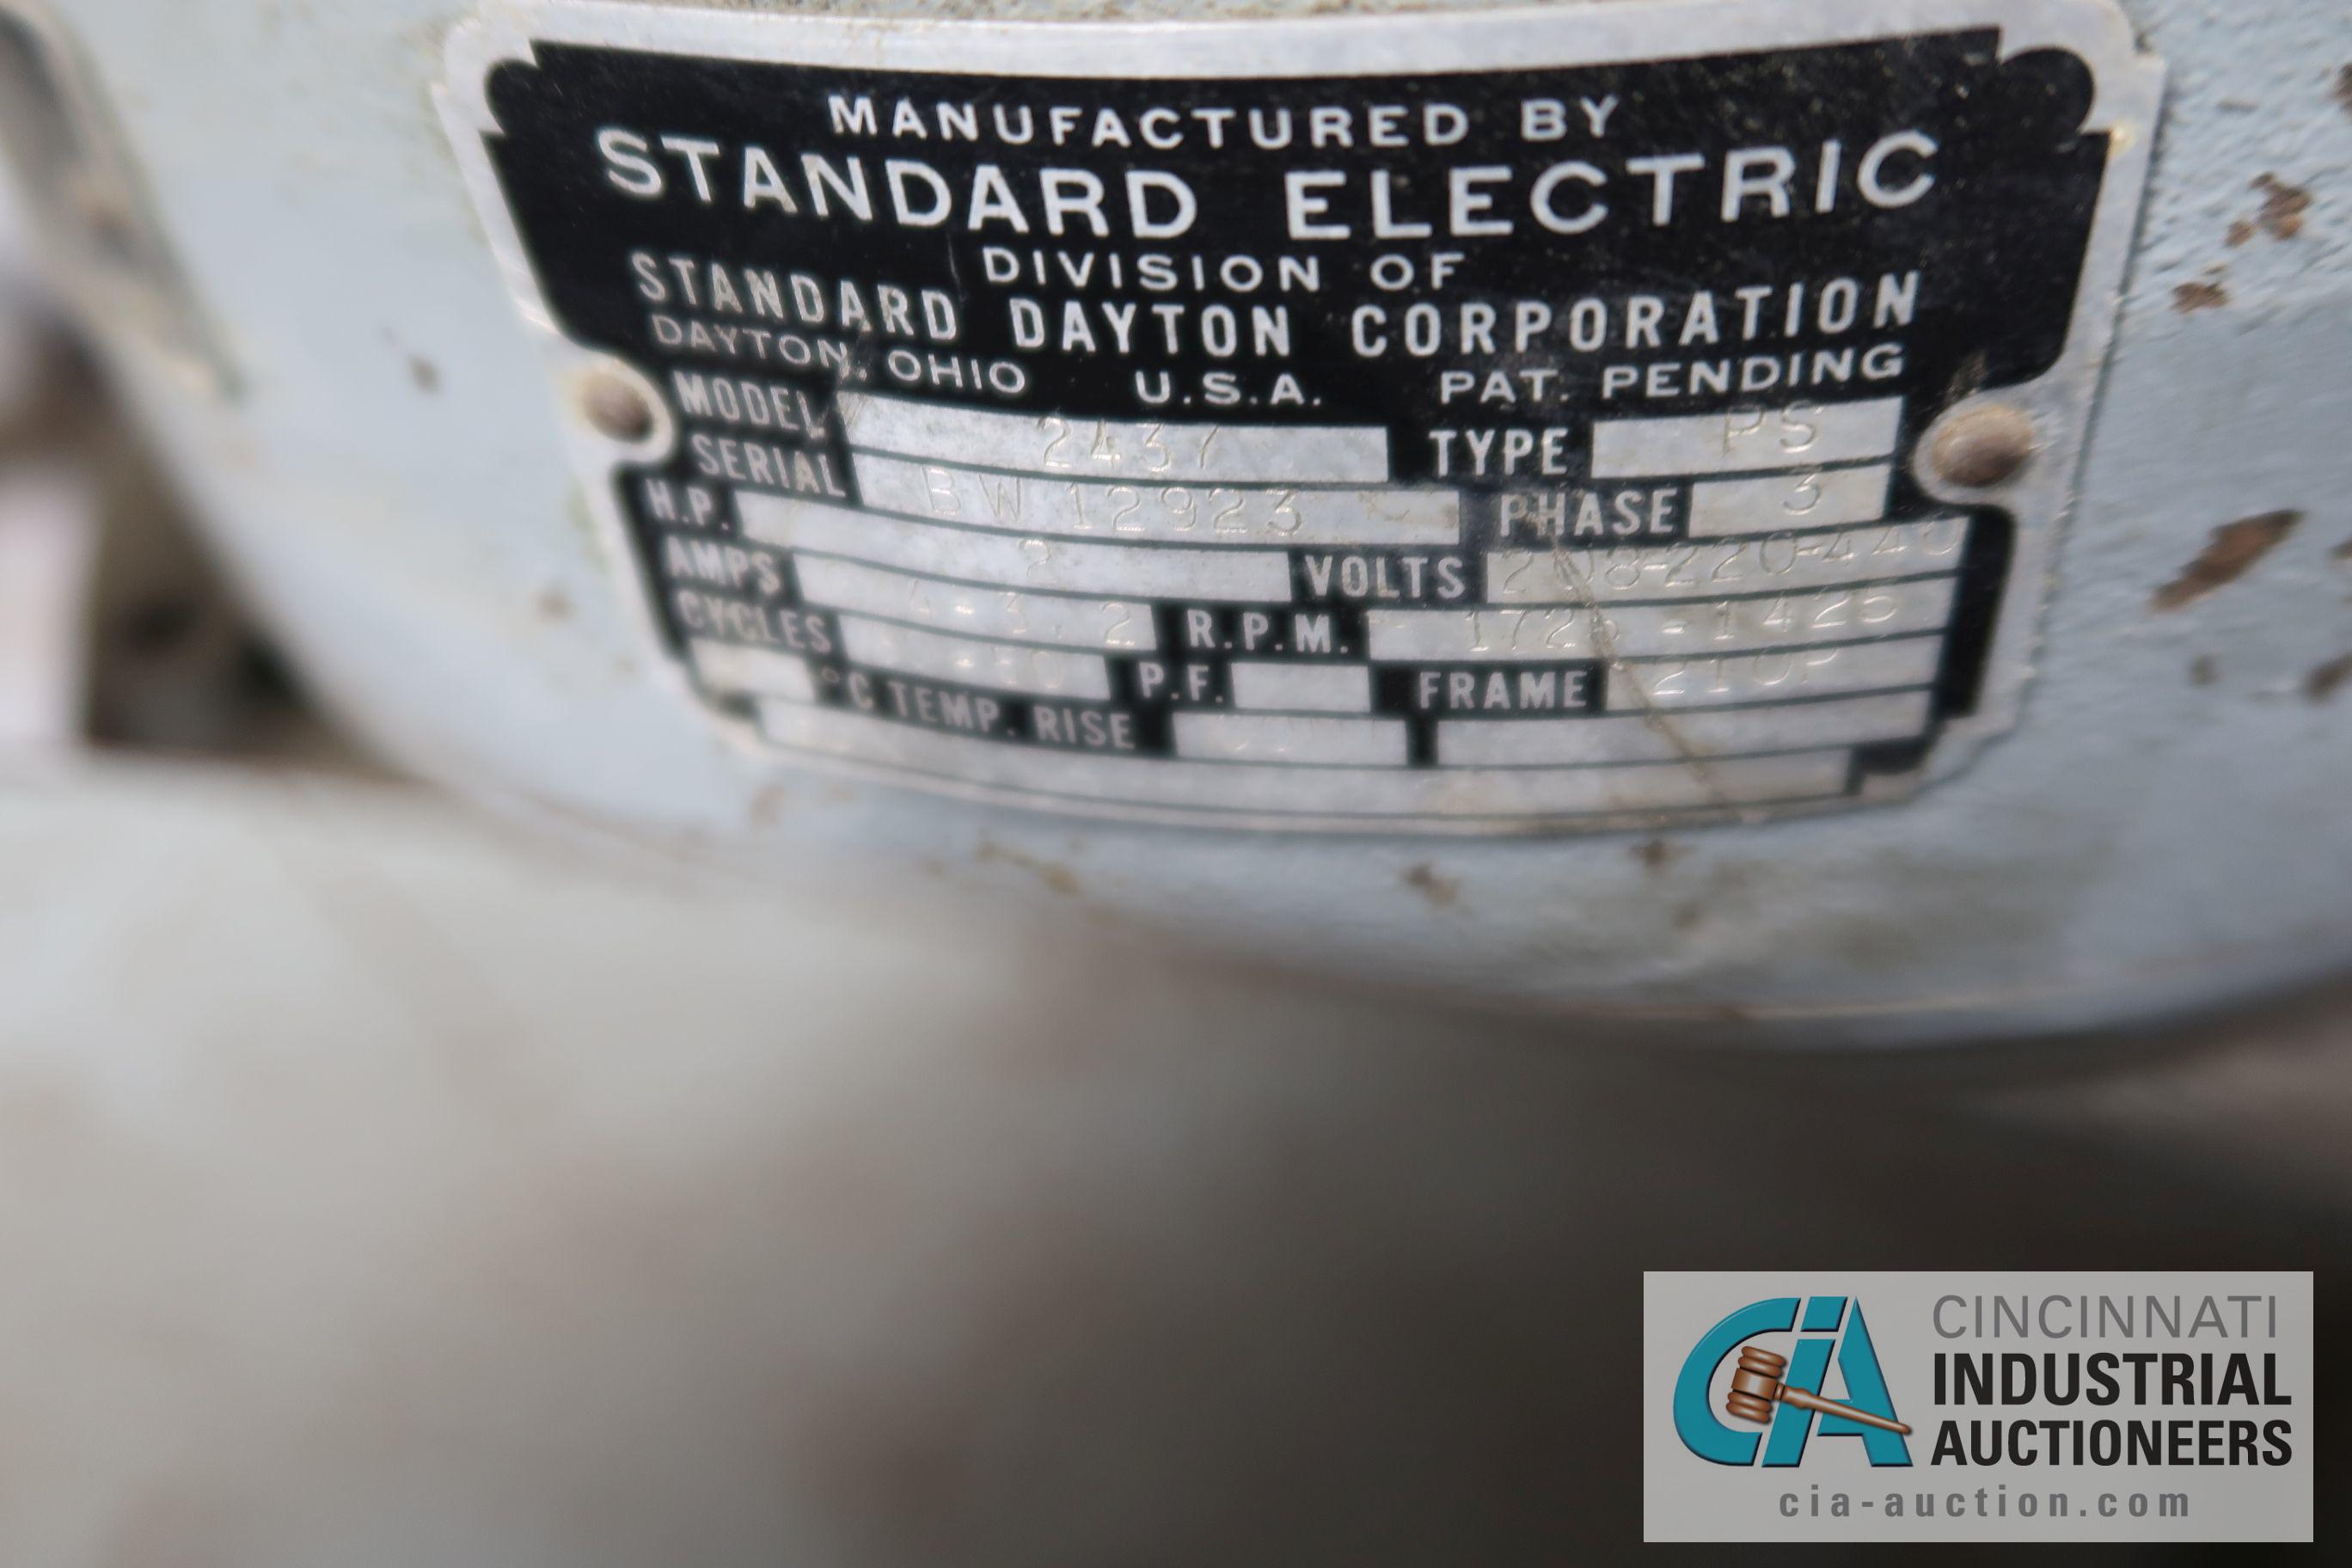 "2 HP CINCINNATI VERTICAL MILLING MACHINE; S/N 6J4V5L-155 WITH DRO, 10"" X 42"" POWER FEED TABLE - Image 6 of 8"